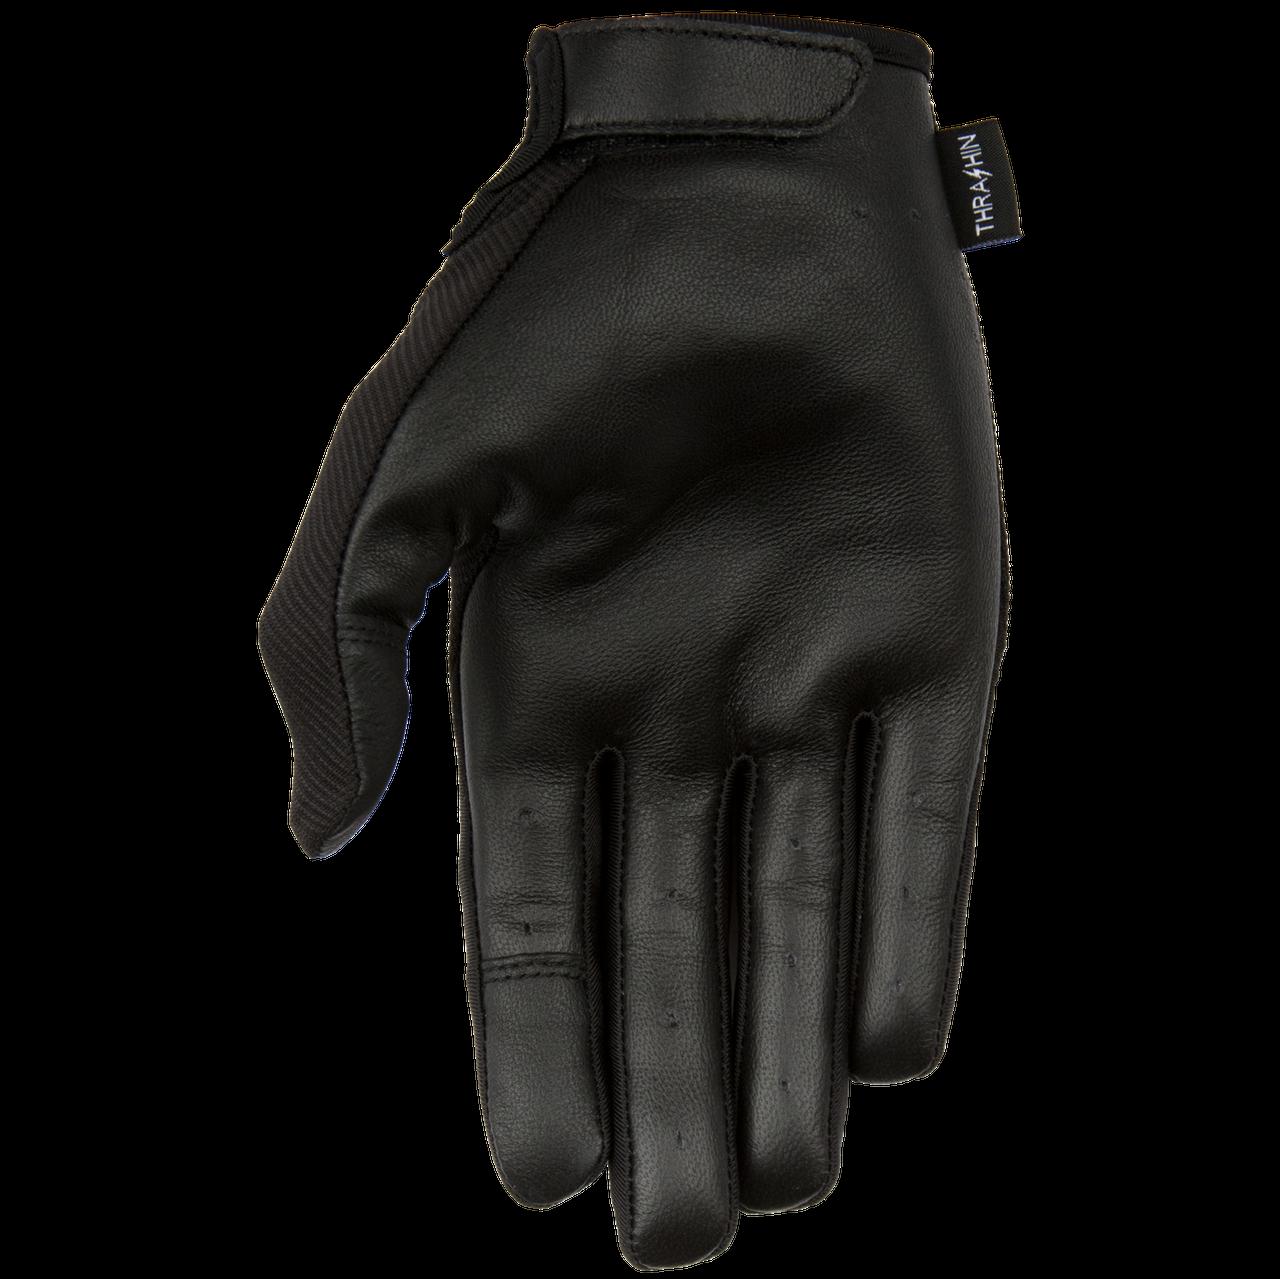 Thrashin Supply Co. Stealth Glove with Leather Palm| DeadbeatCustoms.com